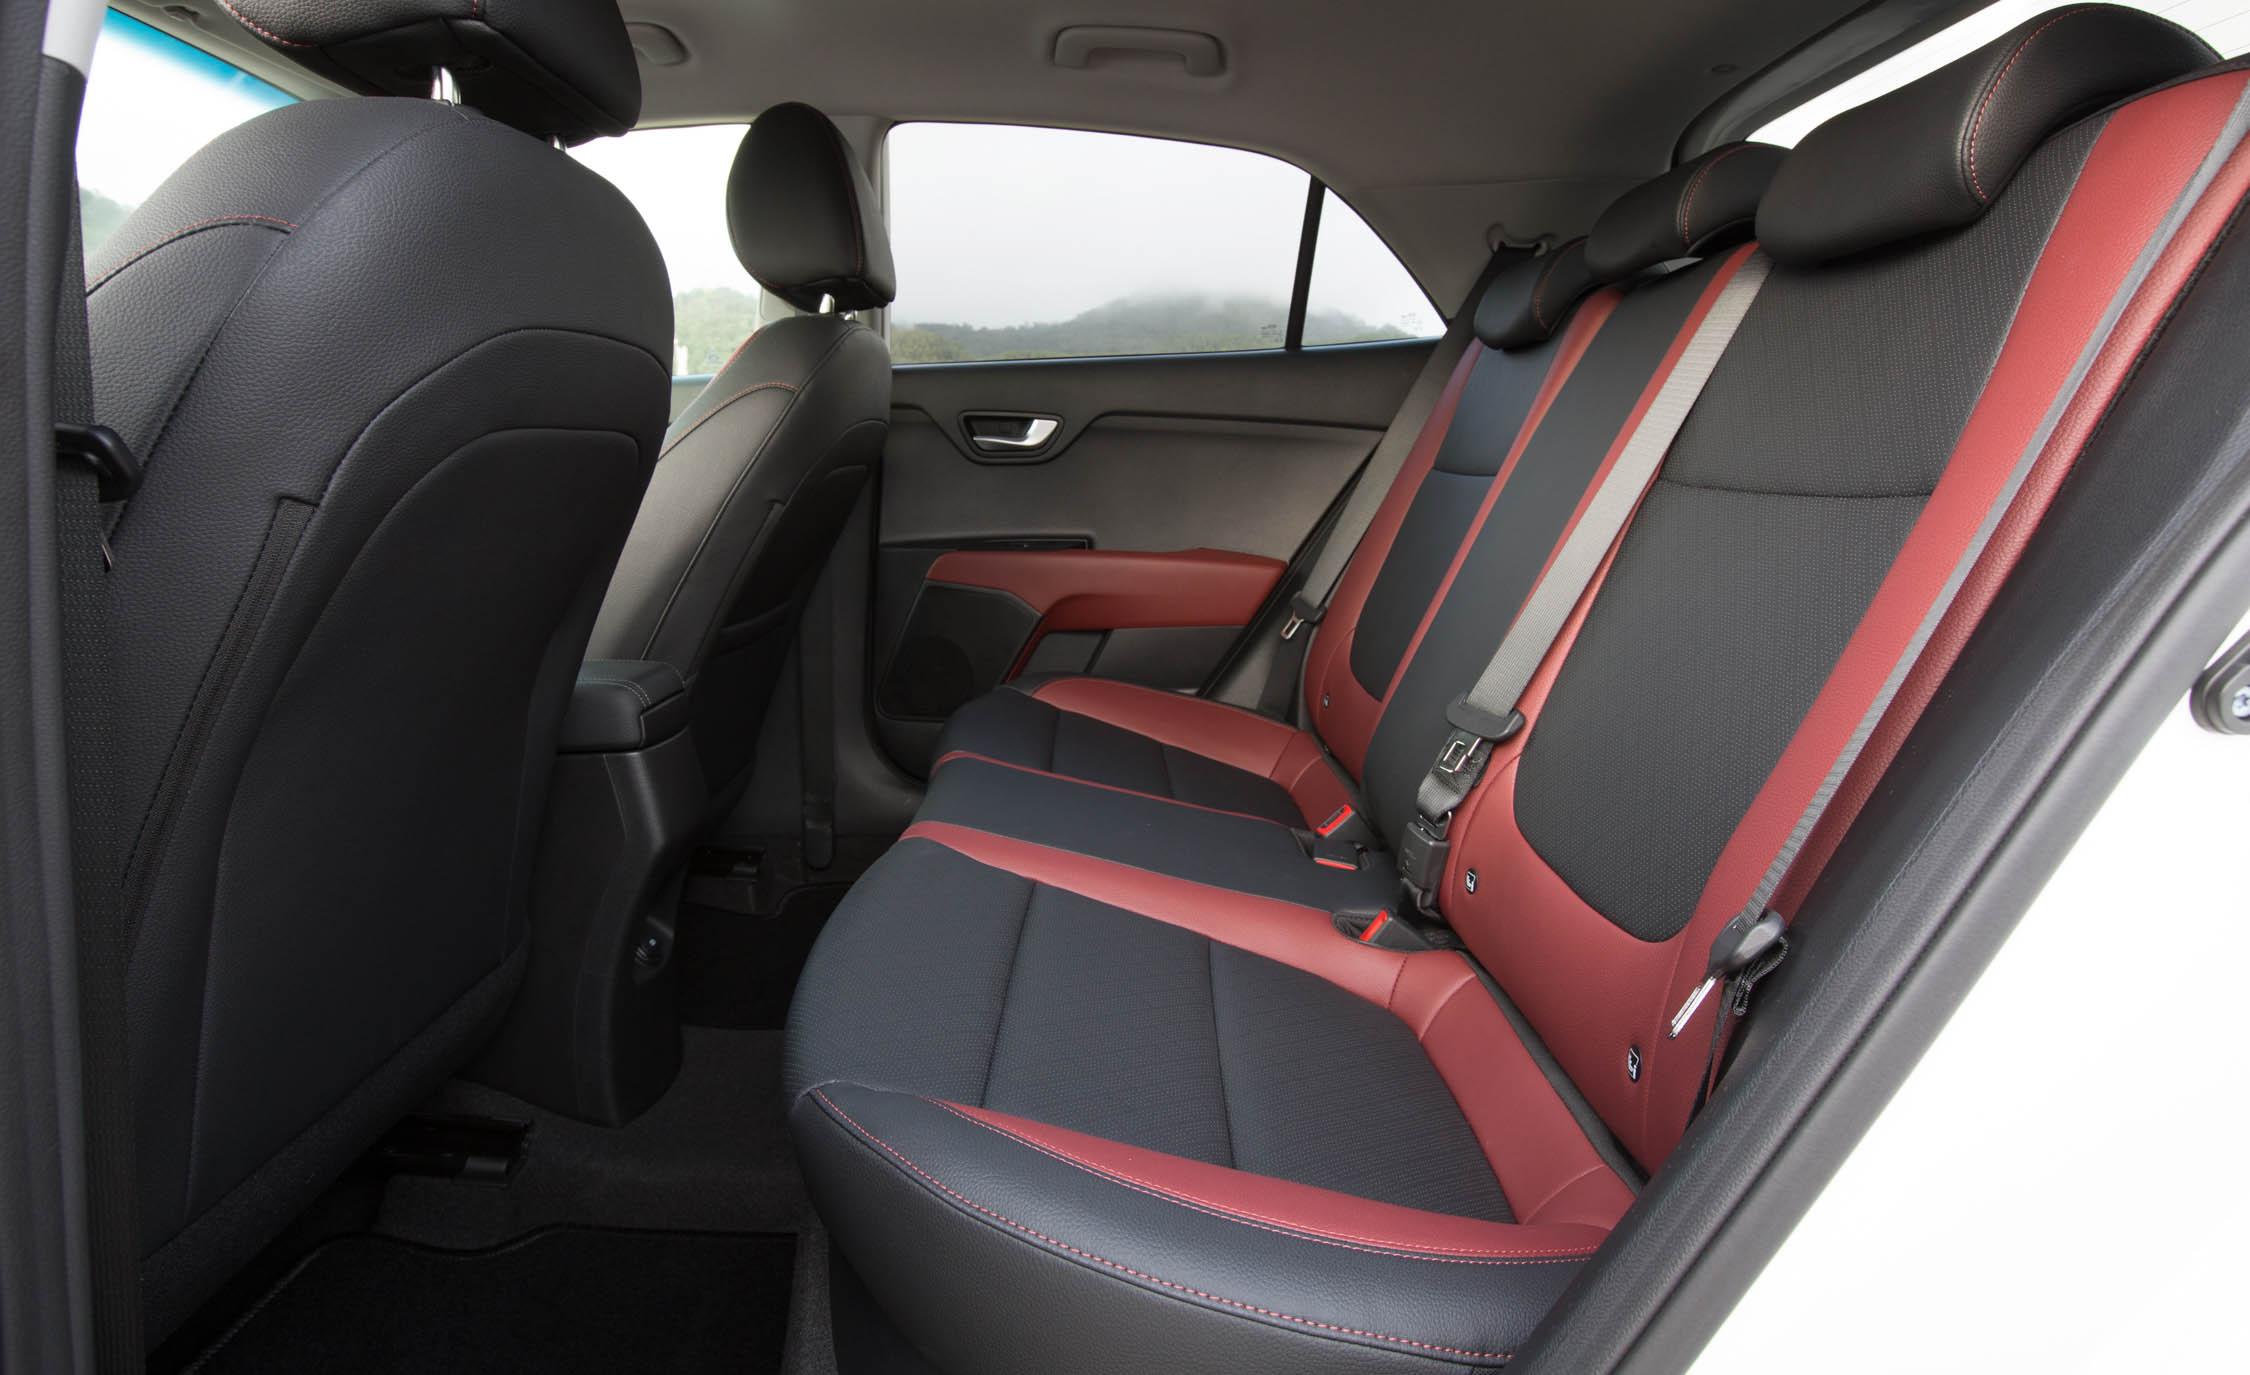 2018 Kia Rio Hatchback Interior Seats Rear (Photo 28 of 49)